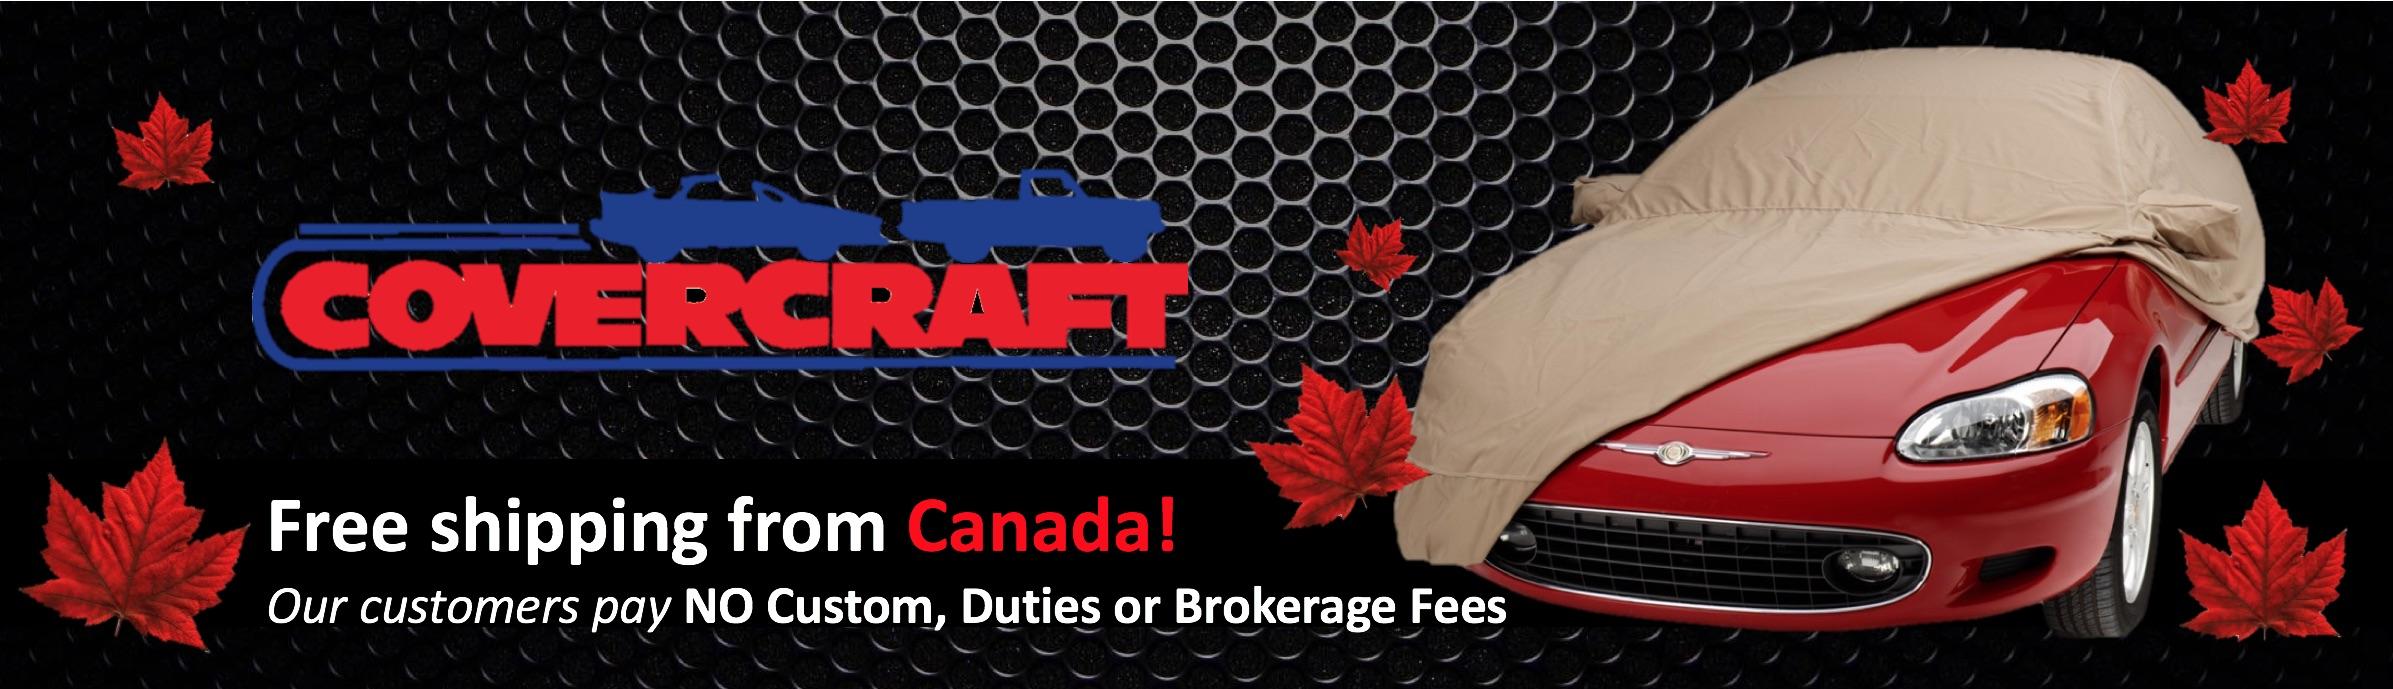 Covercraft Brand Banner - CAD